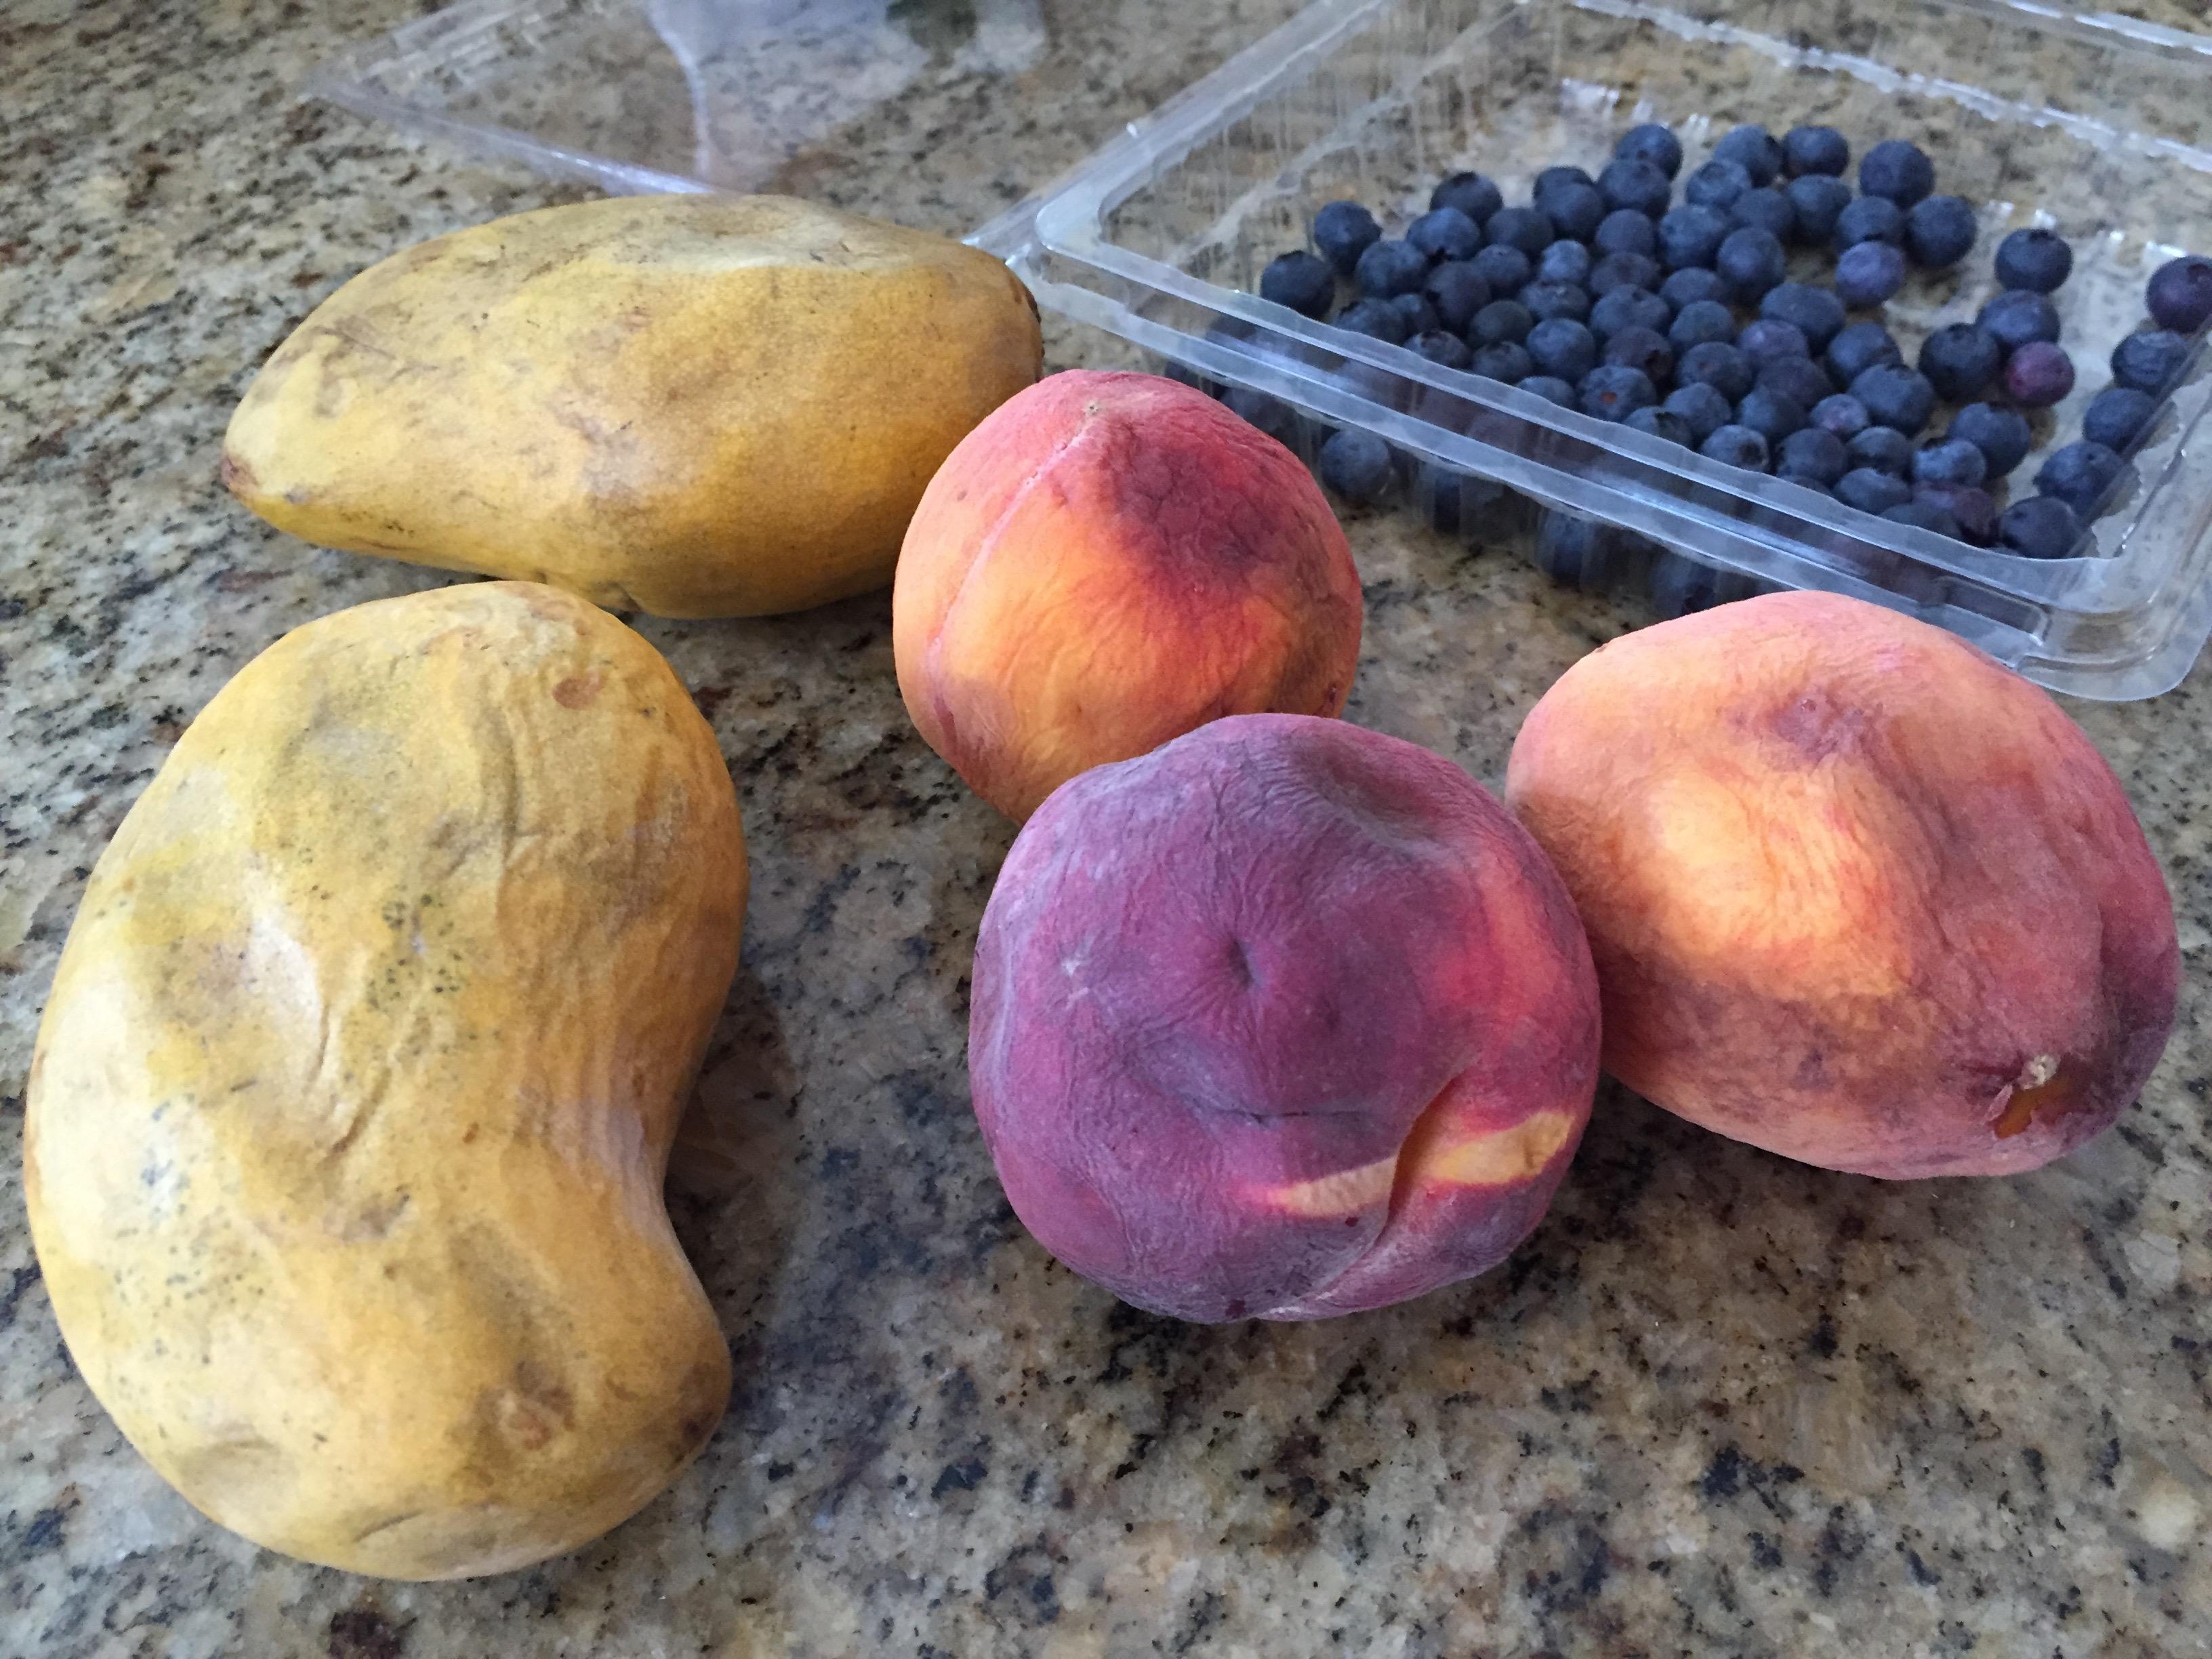 Kompot over-ripe fruit